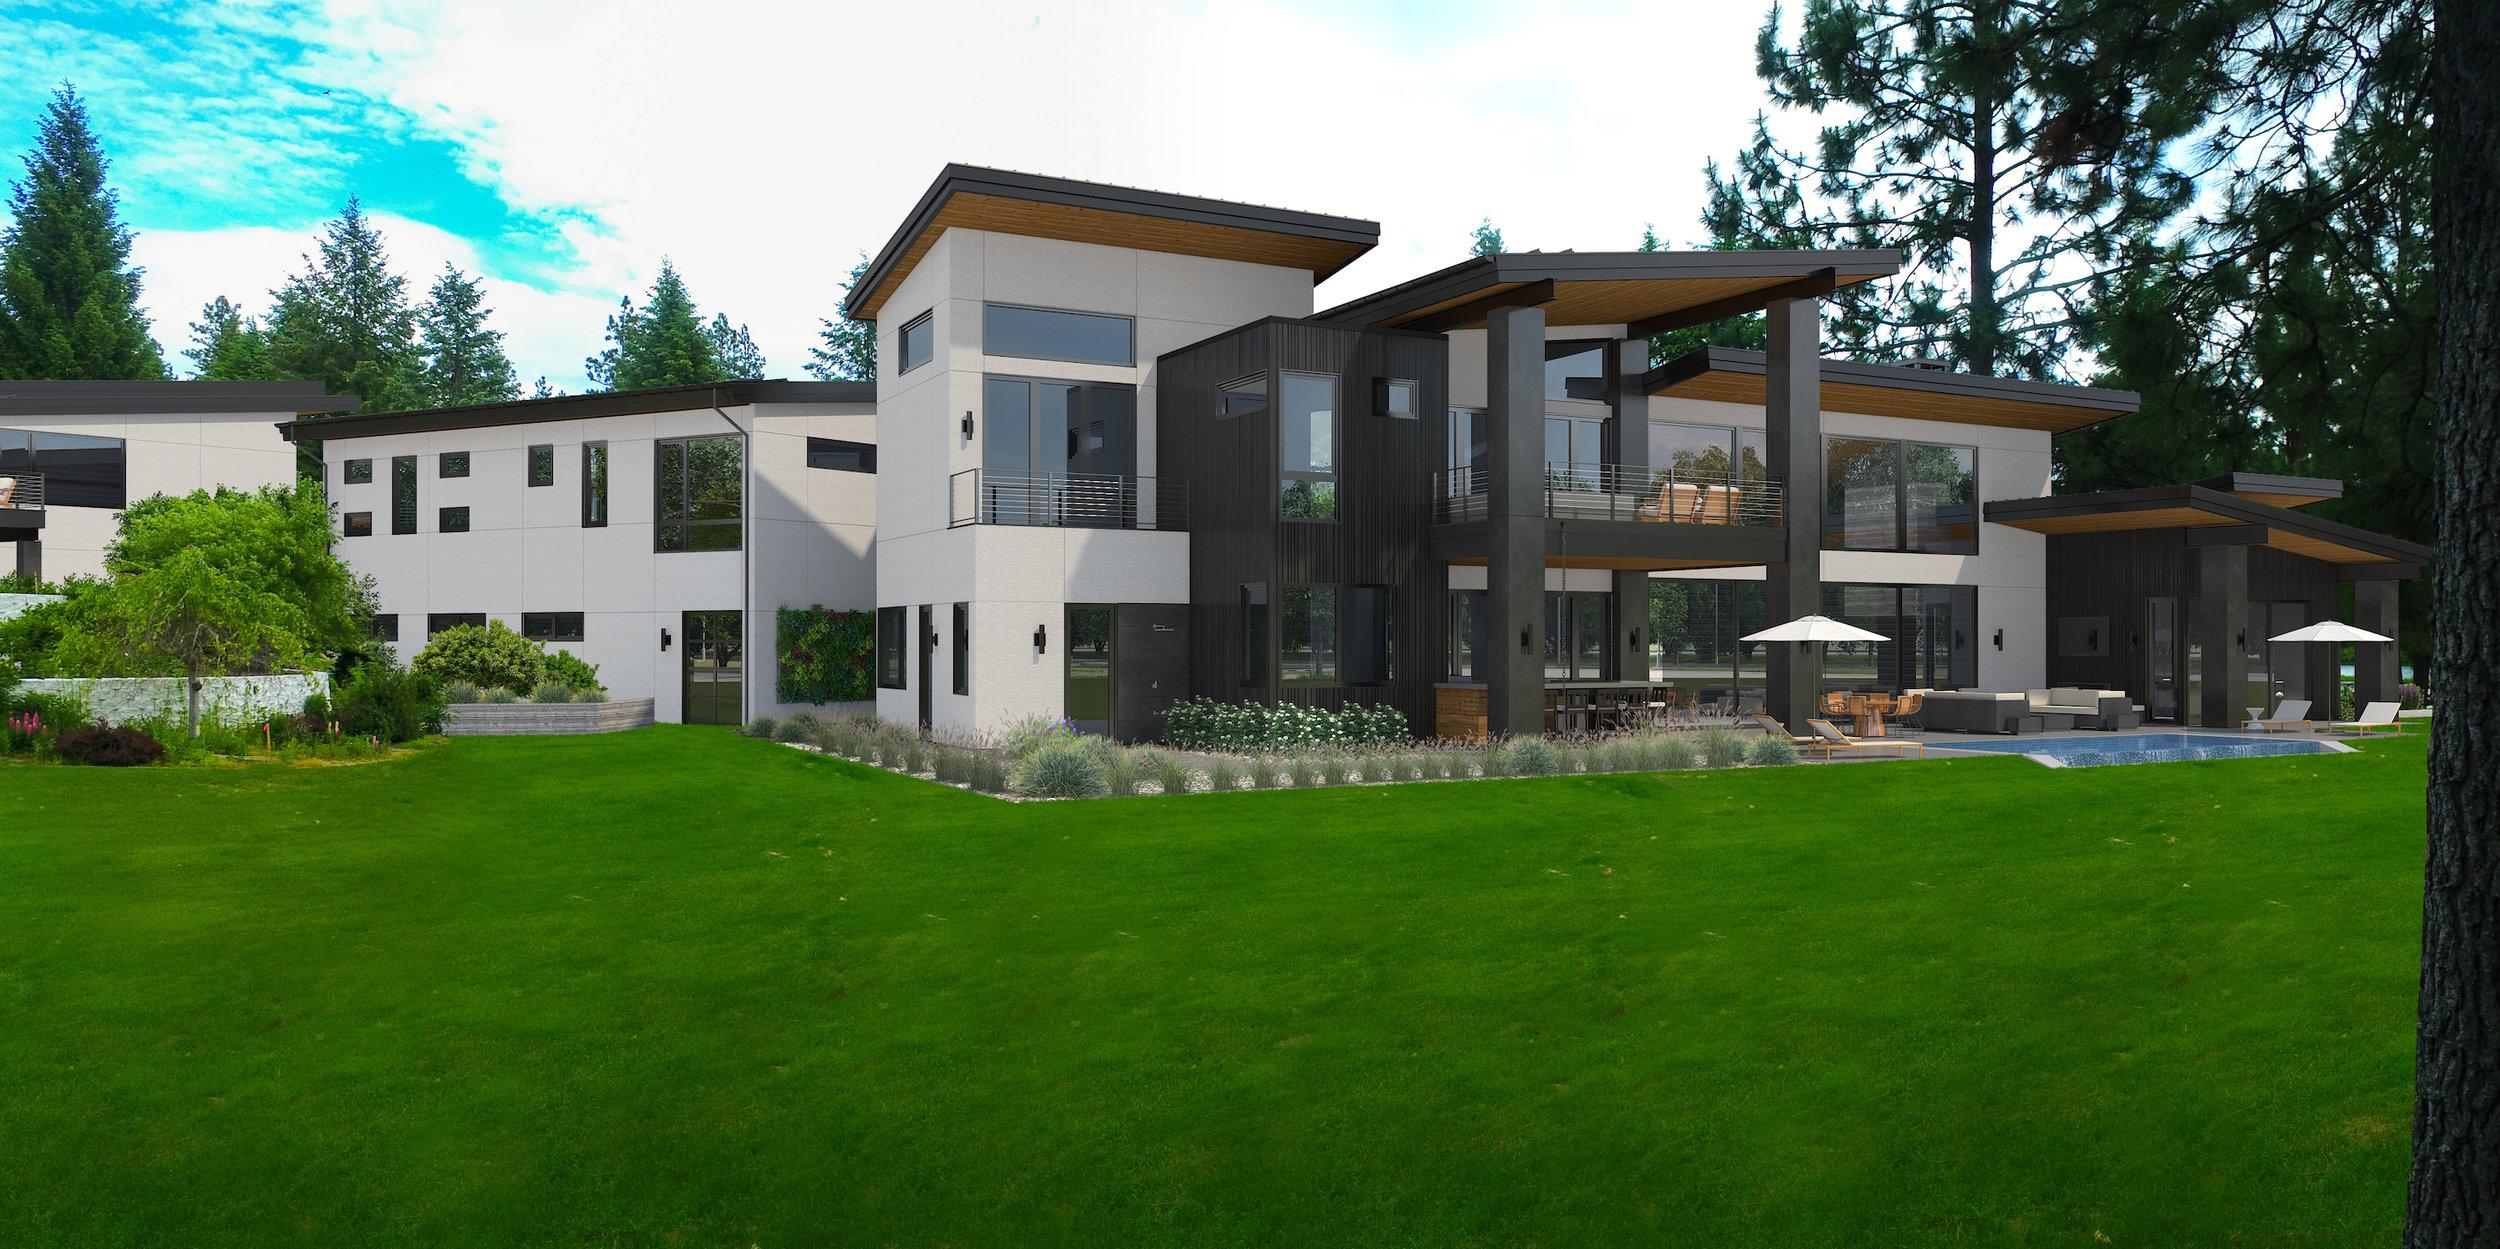 0715 Cheeley Residence c1 opt4.jpg